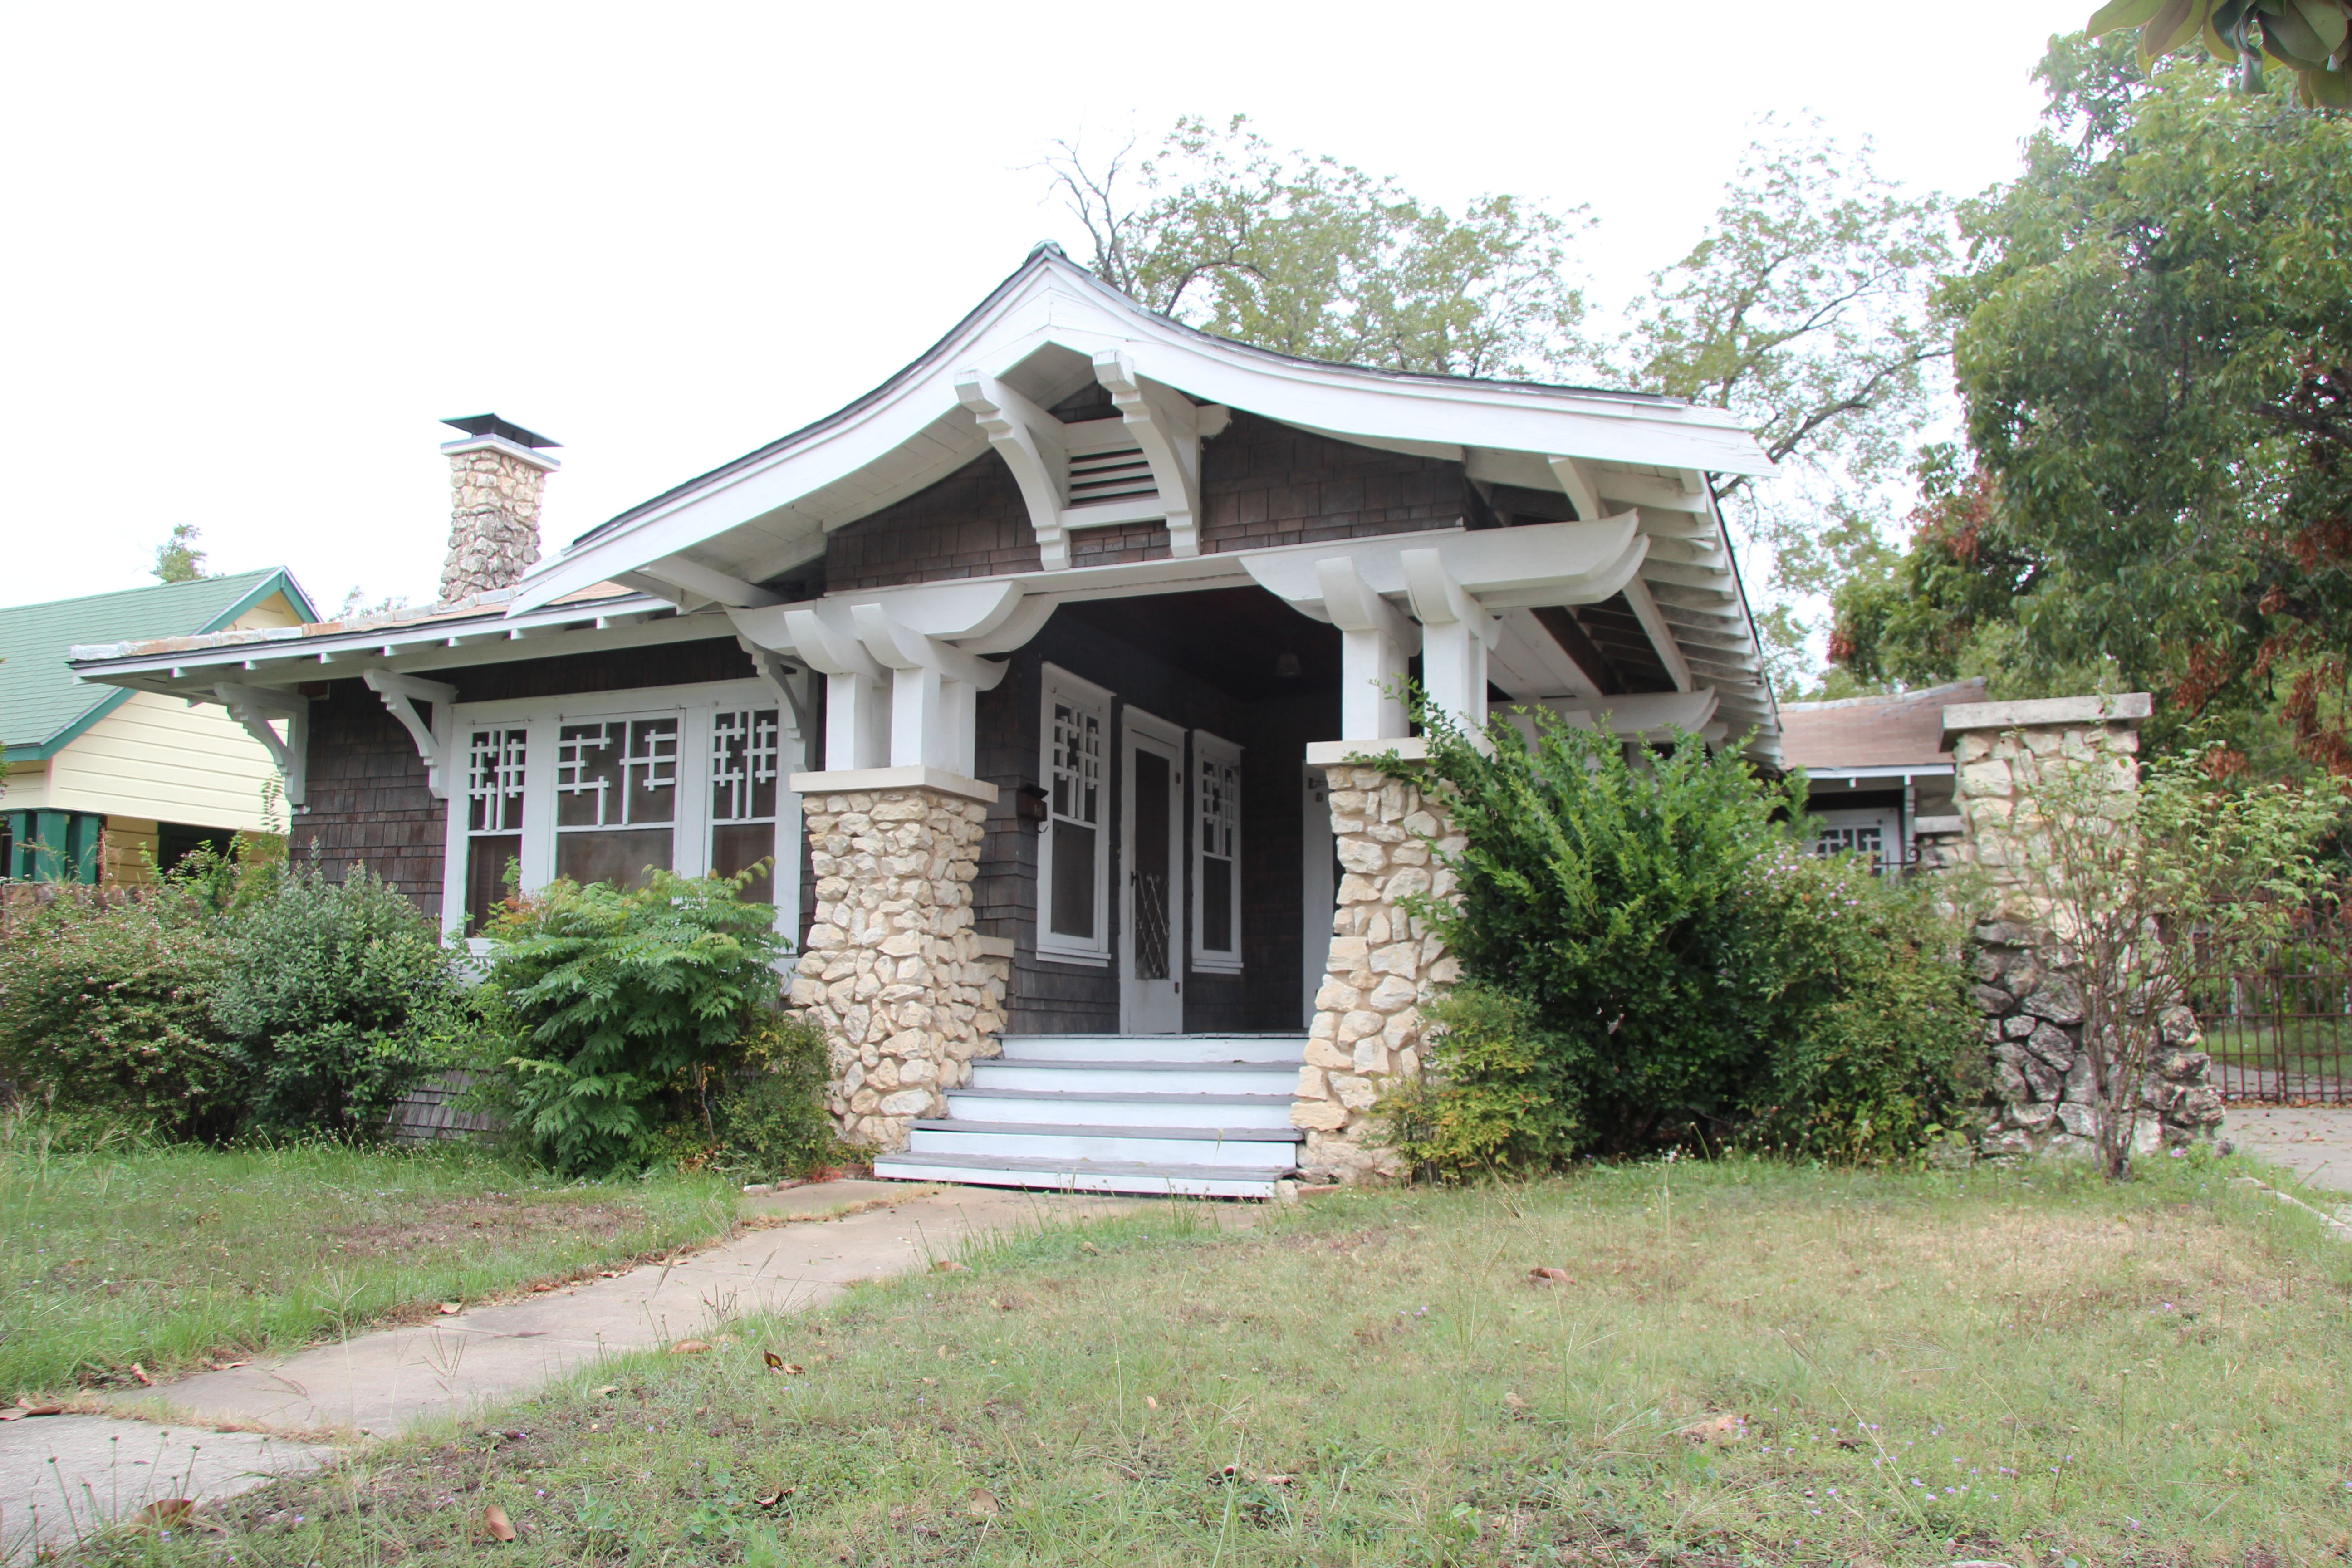 Asian Style airplane bungalow in San Antonio. I grew up